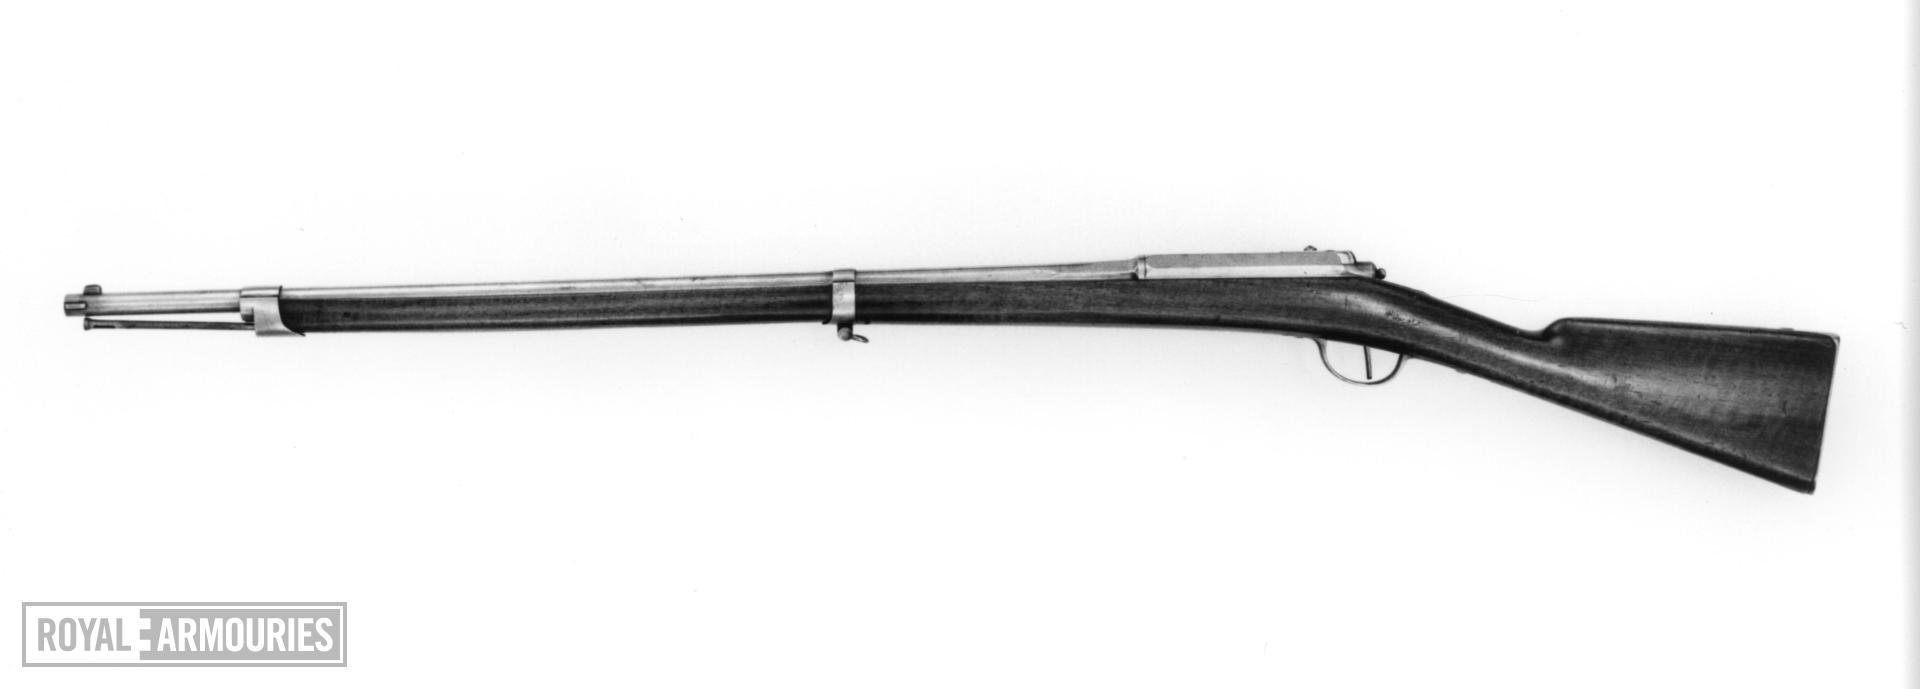 Needlefire breech-loading military rifle - Cloes System